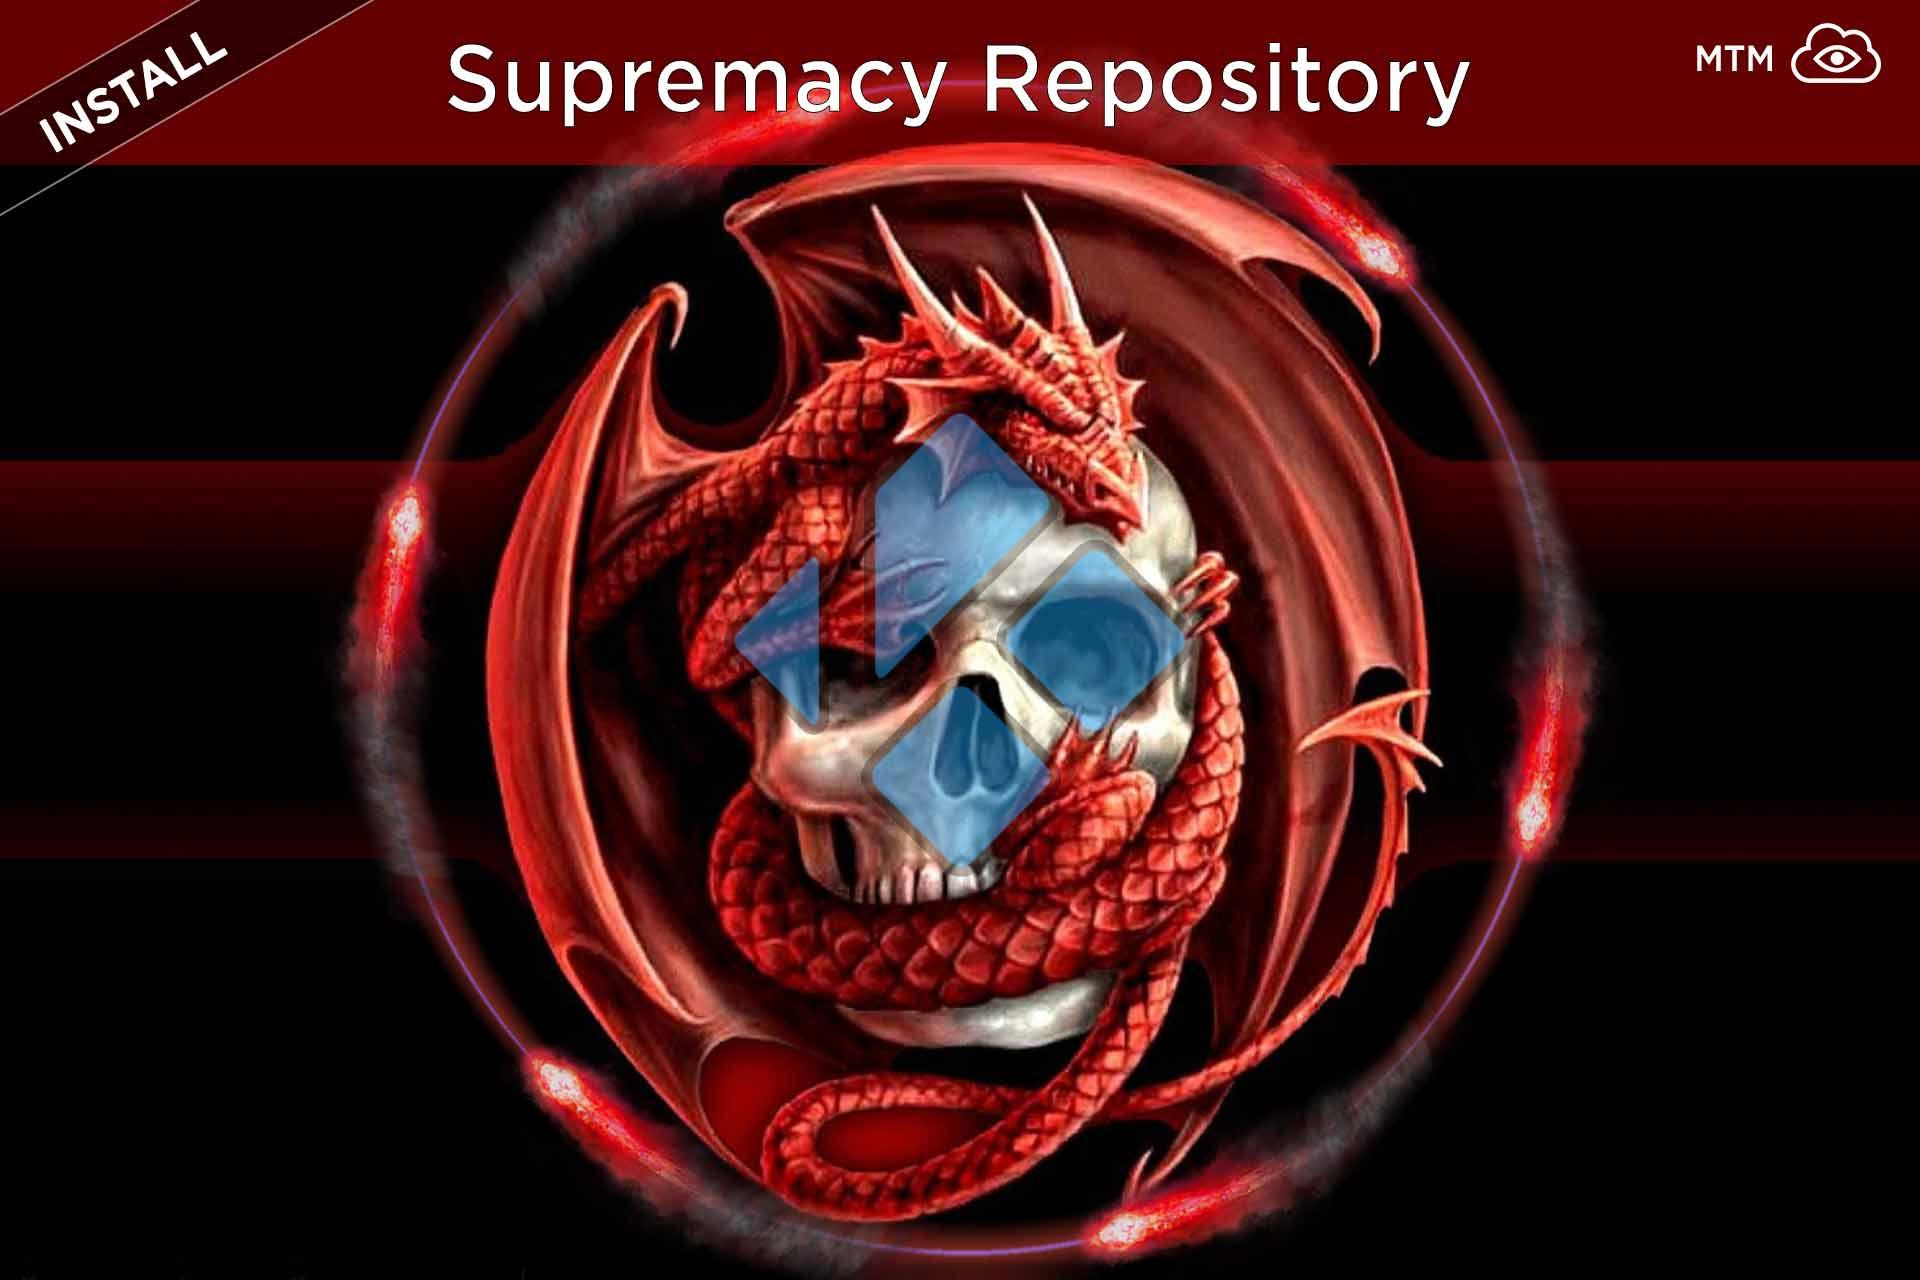 How to Install Supremacy Repo Kodi Repository 2018 | MTM